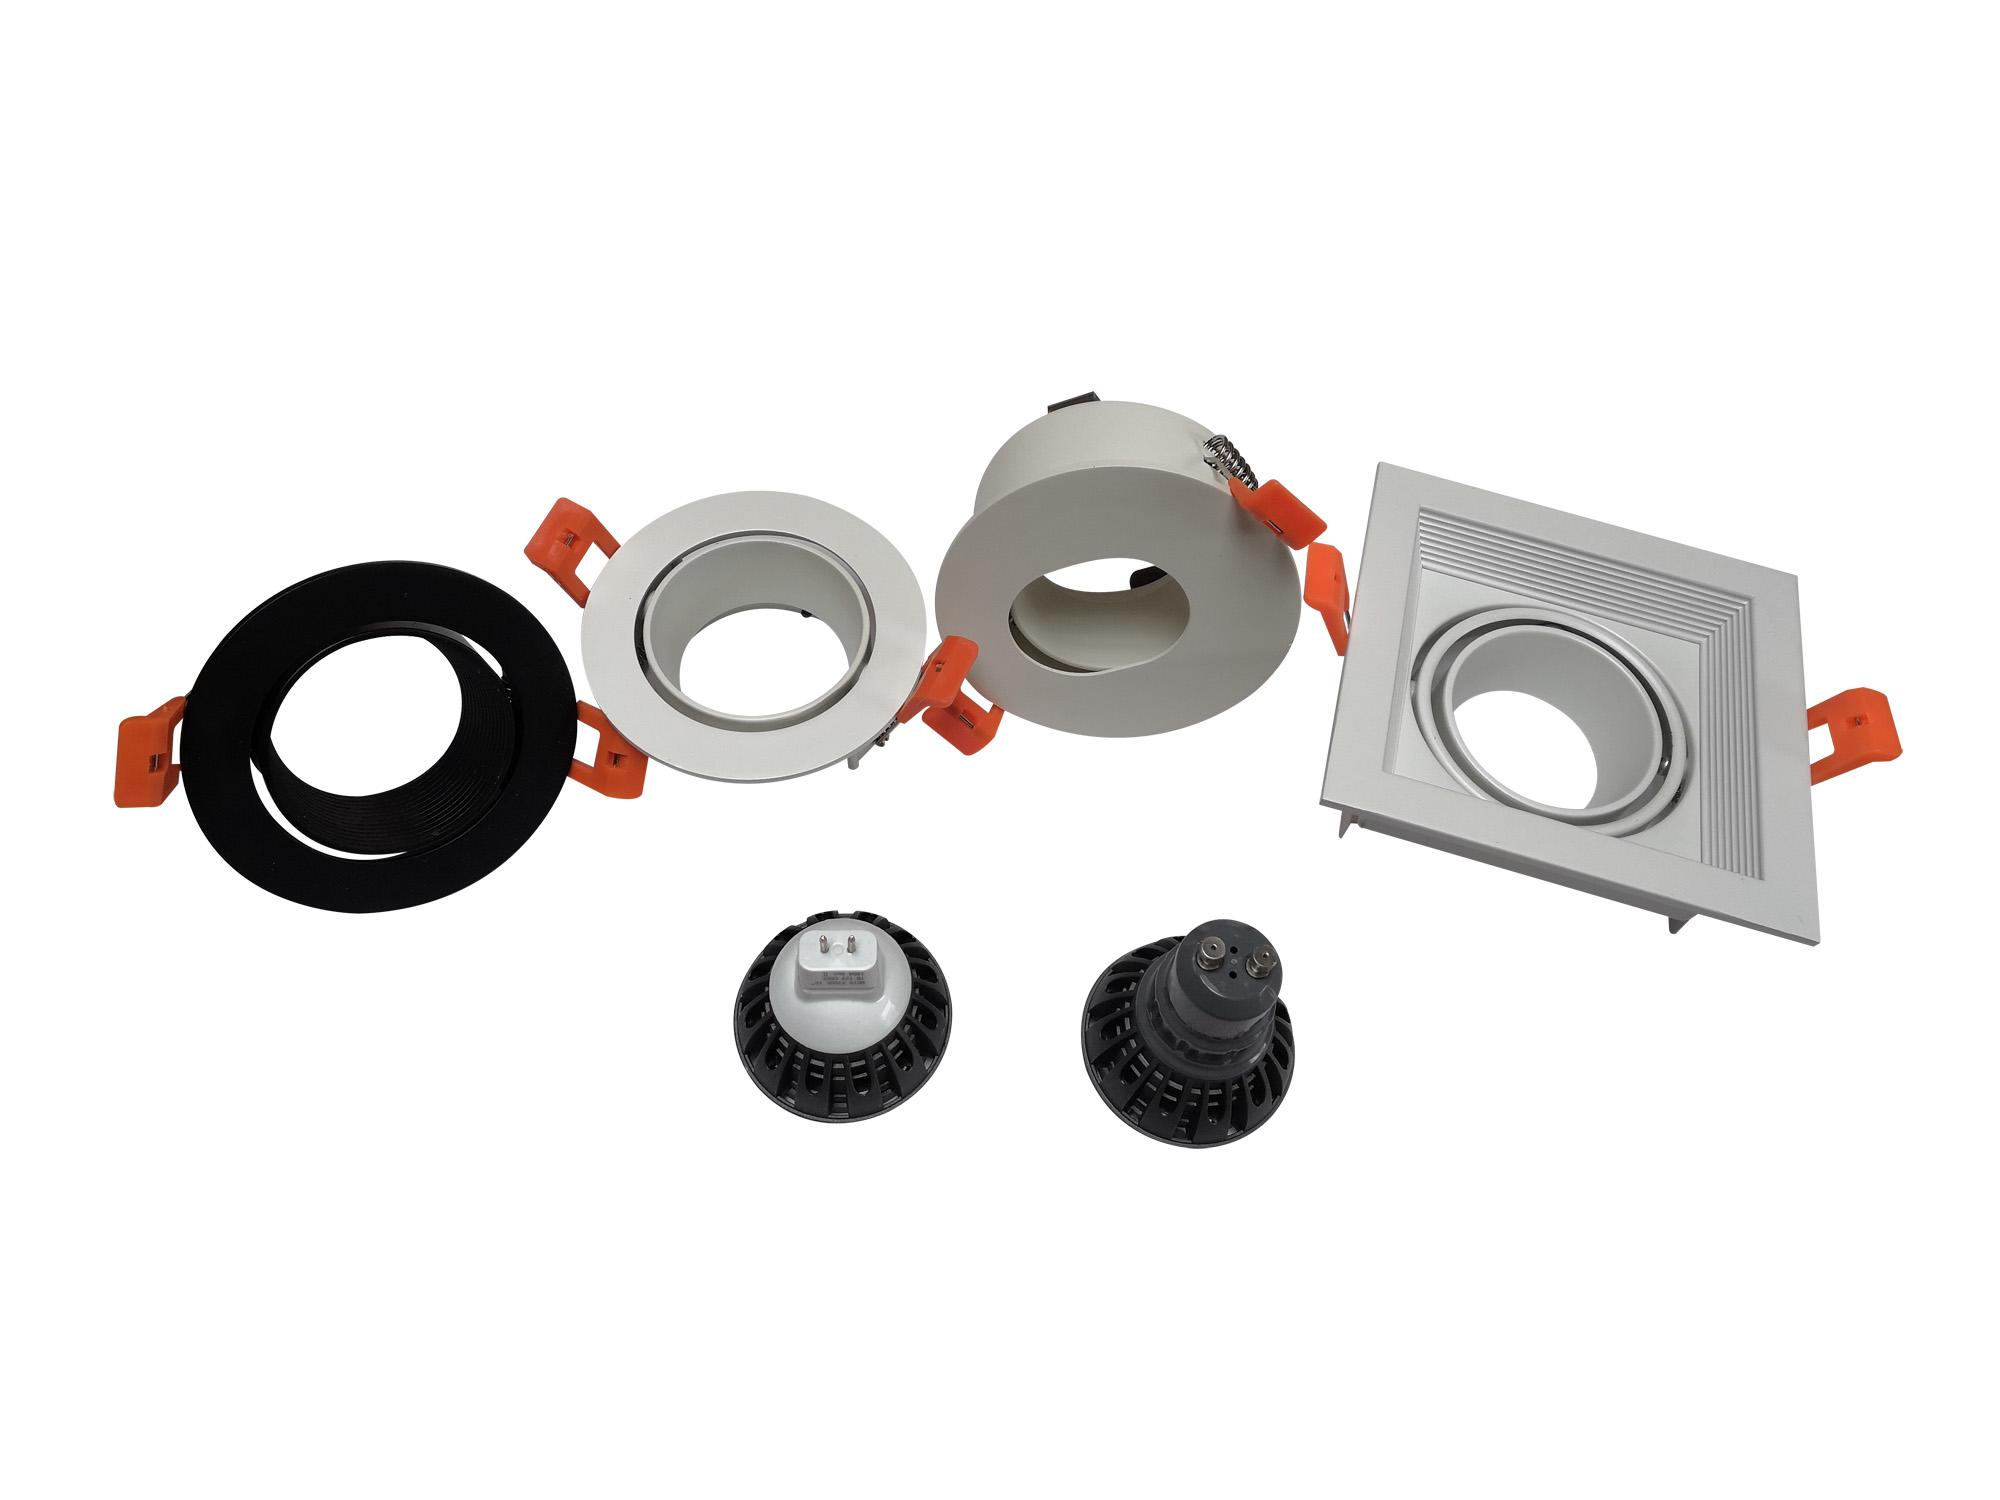 Recessed LED Ceiling Light Adjustable Frame MR16 GU10 Bulb LED Ceiling Spot Light Lighting Fixtures